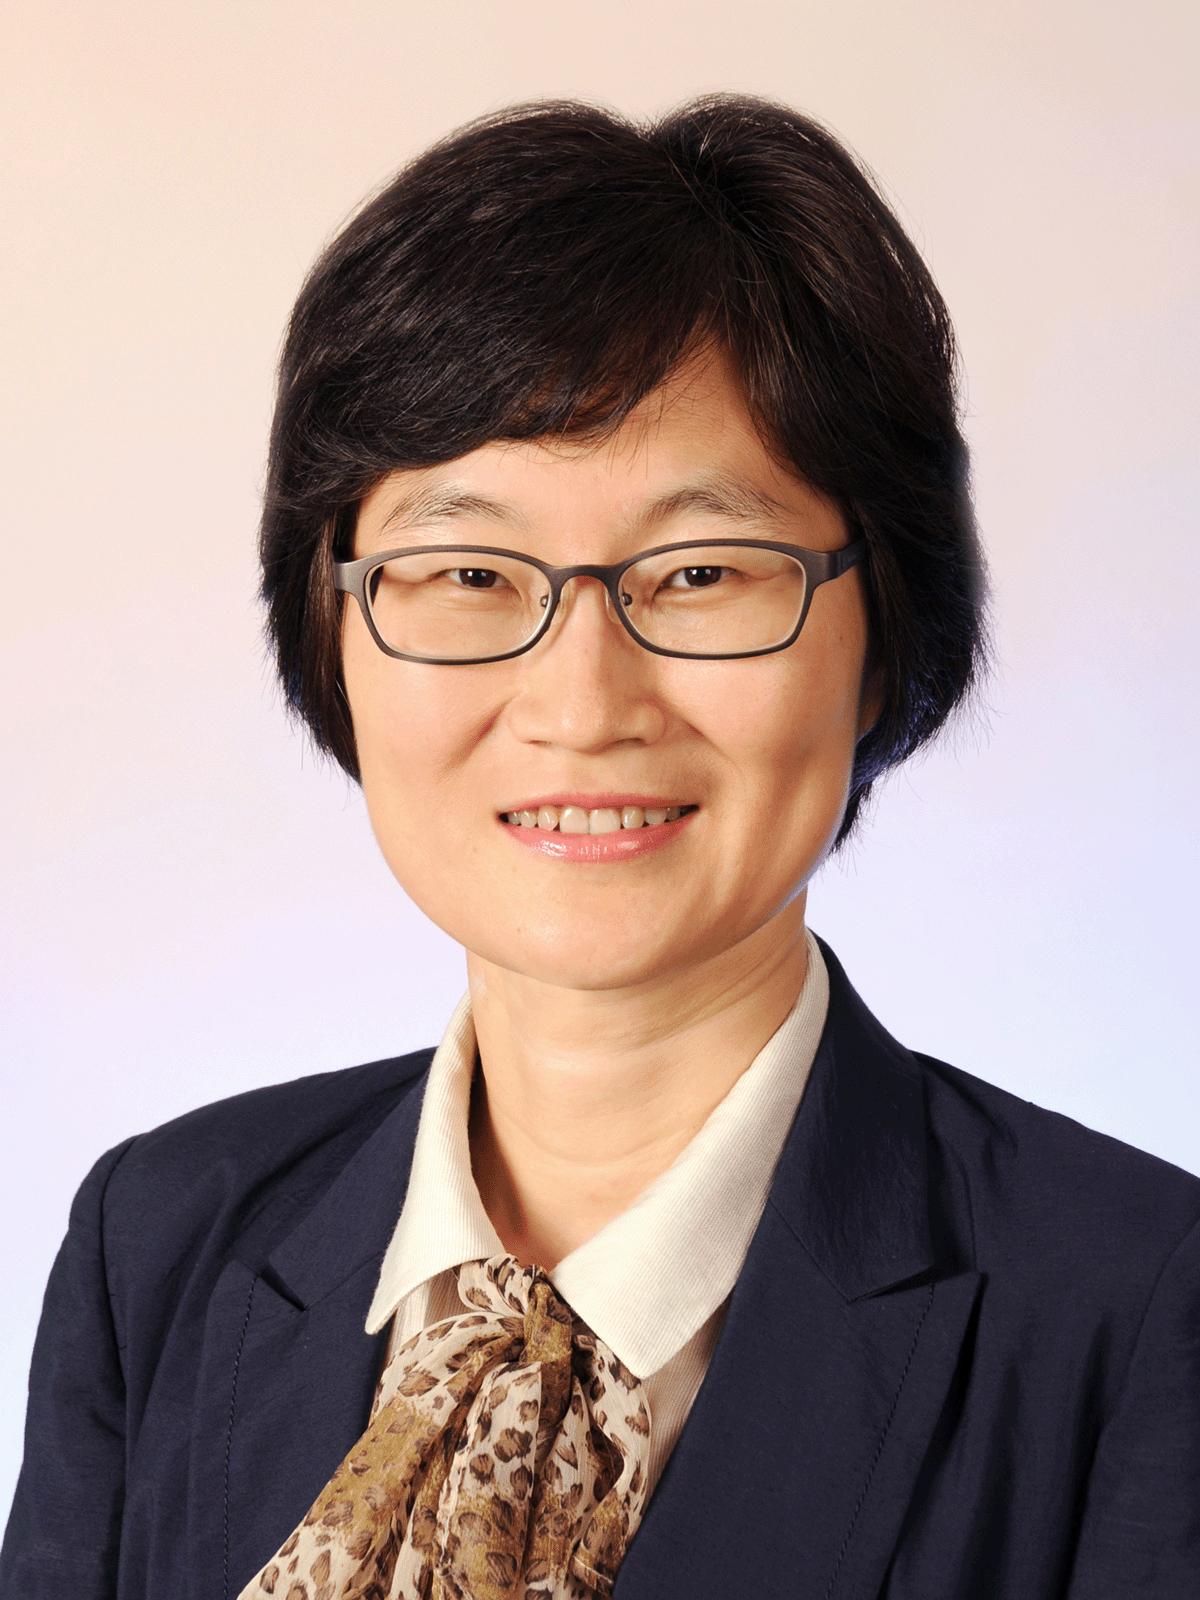 Jung-Ah Lee